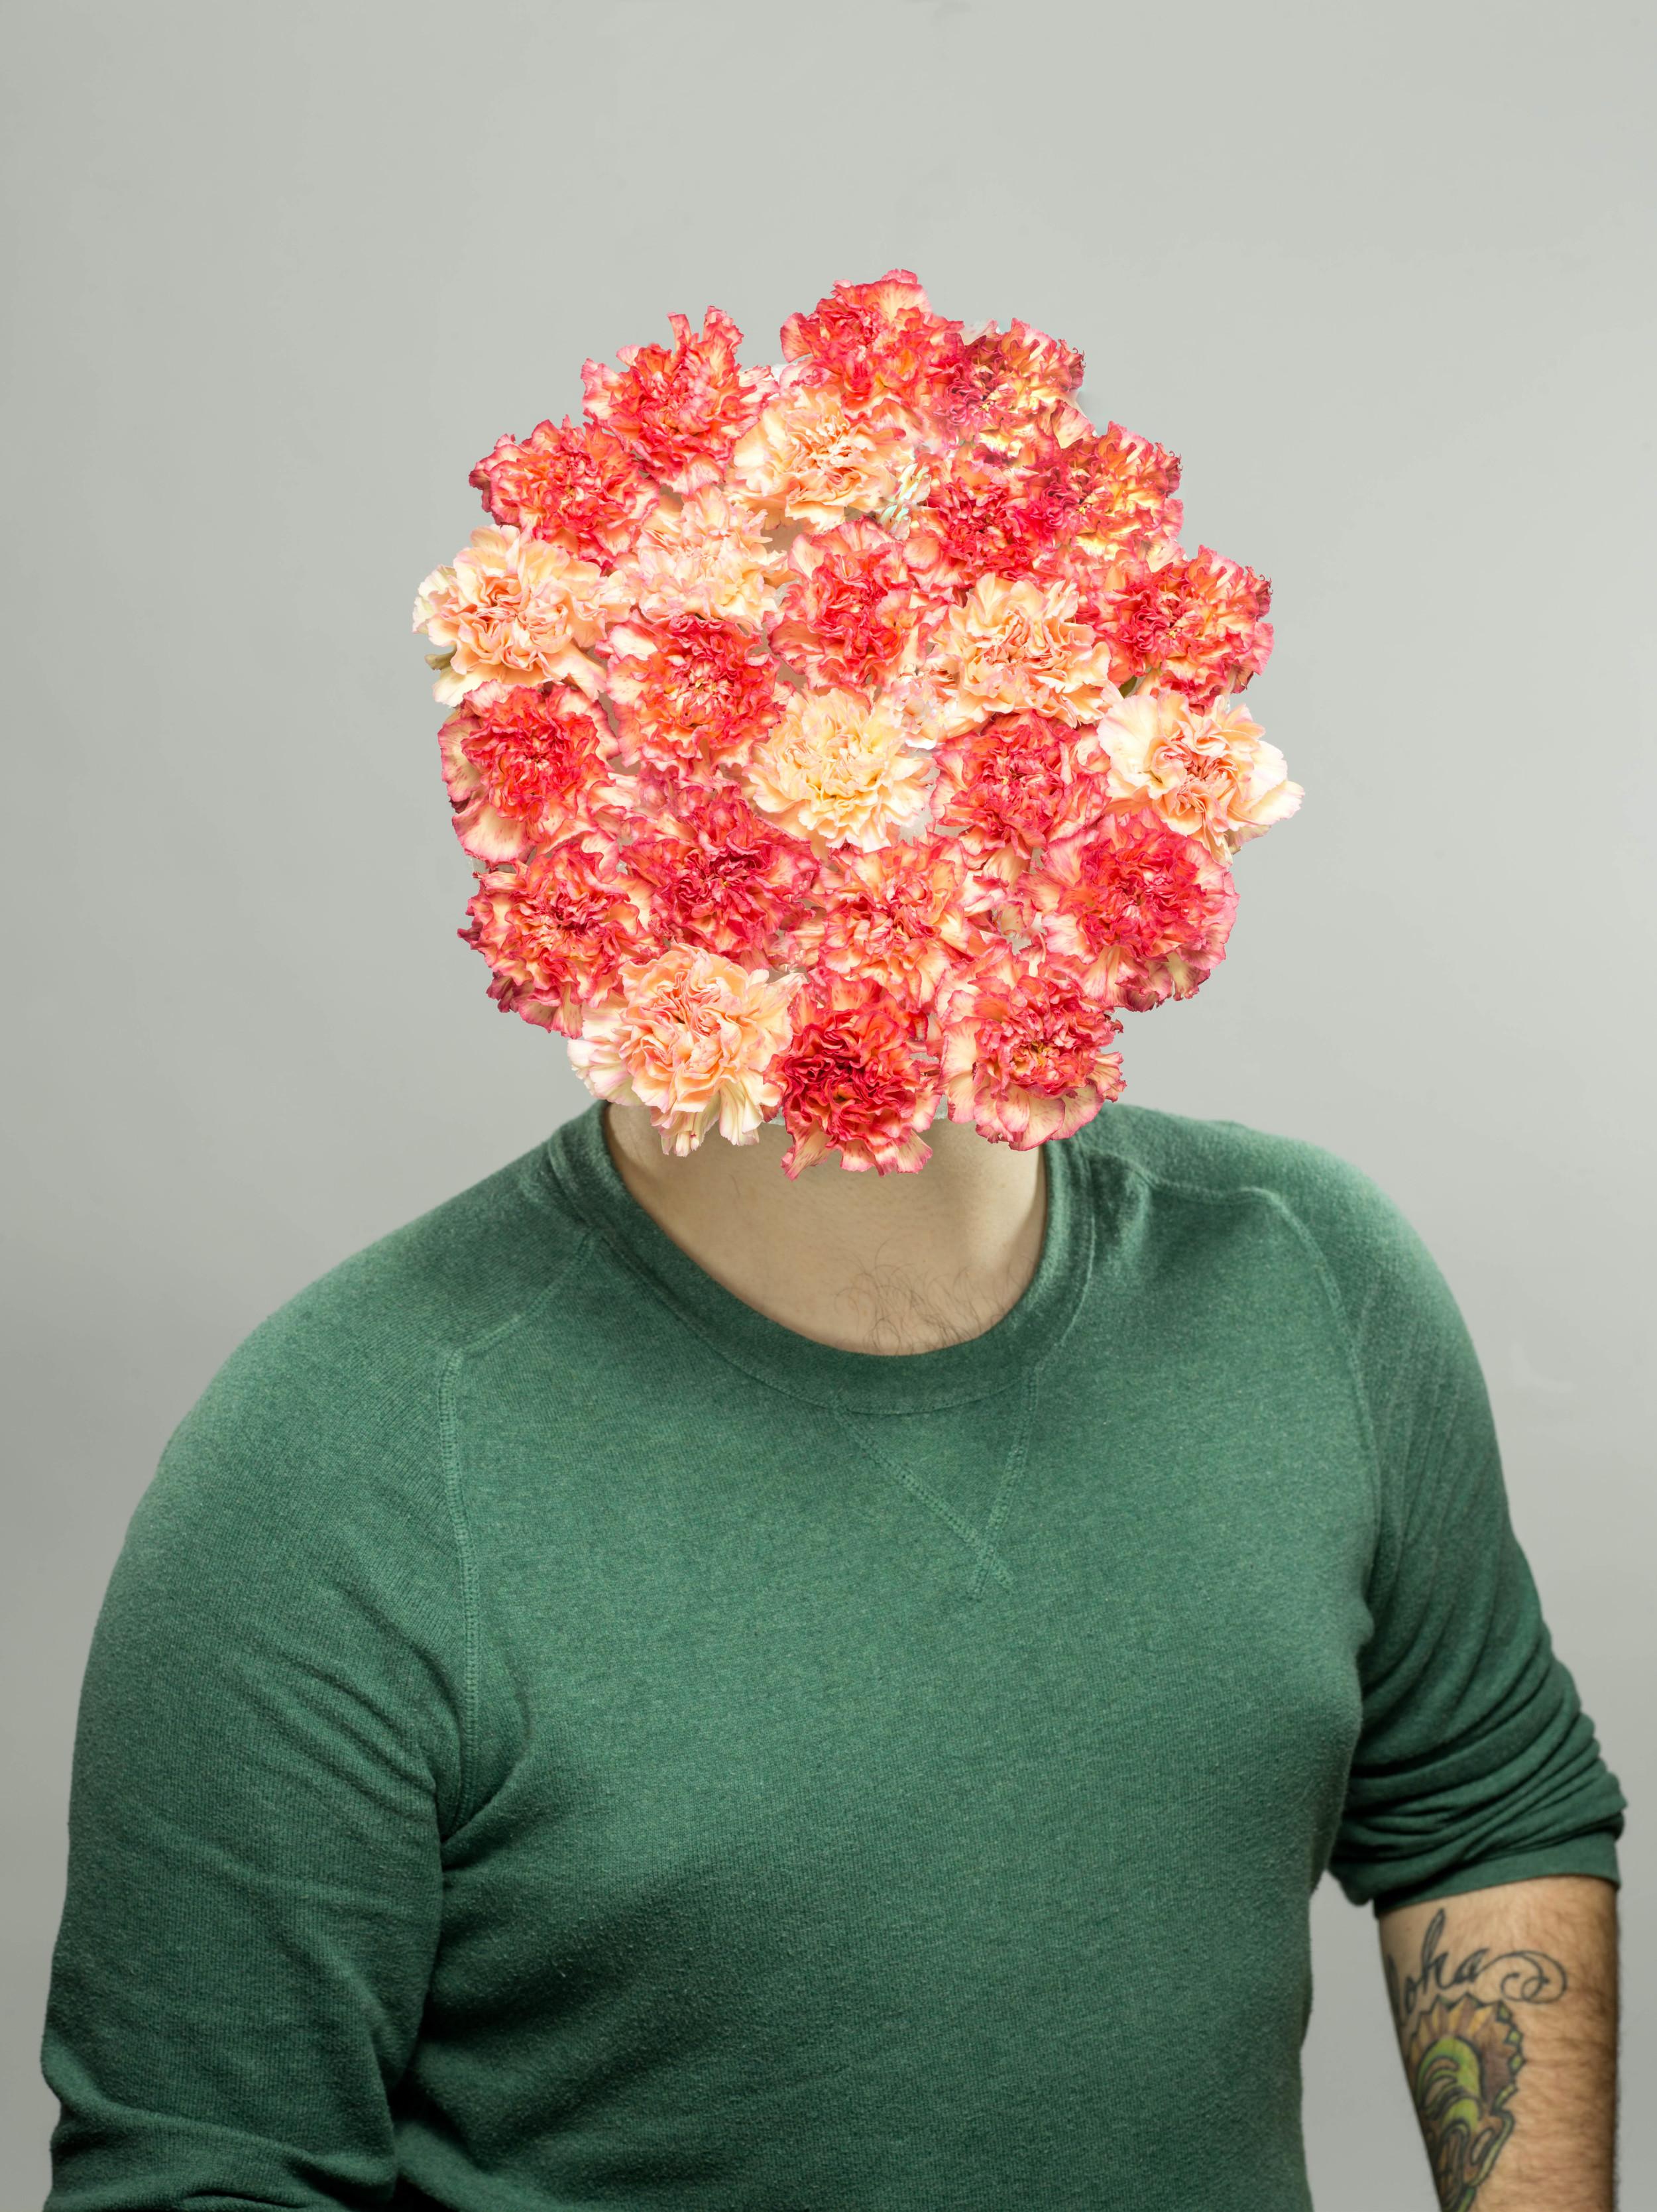 Flower heads day 2 25553.jpg